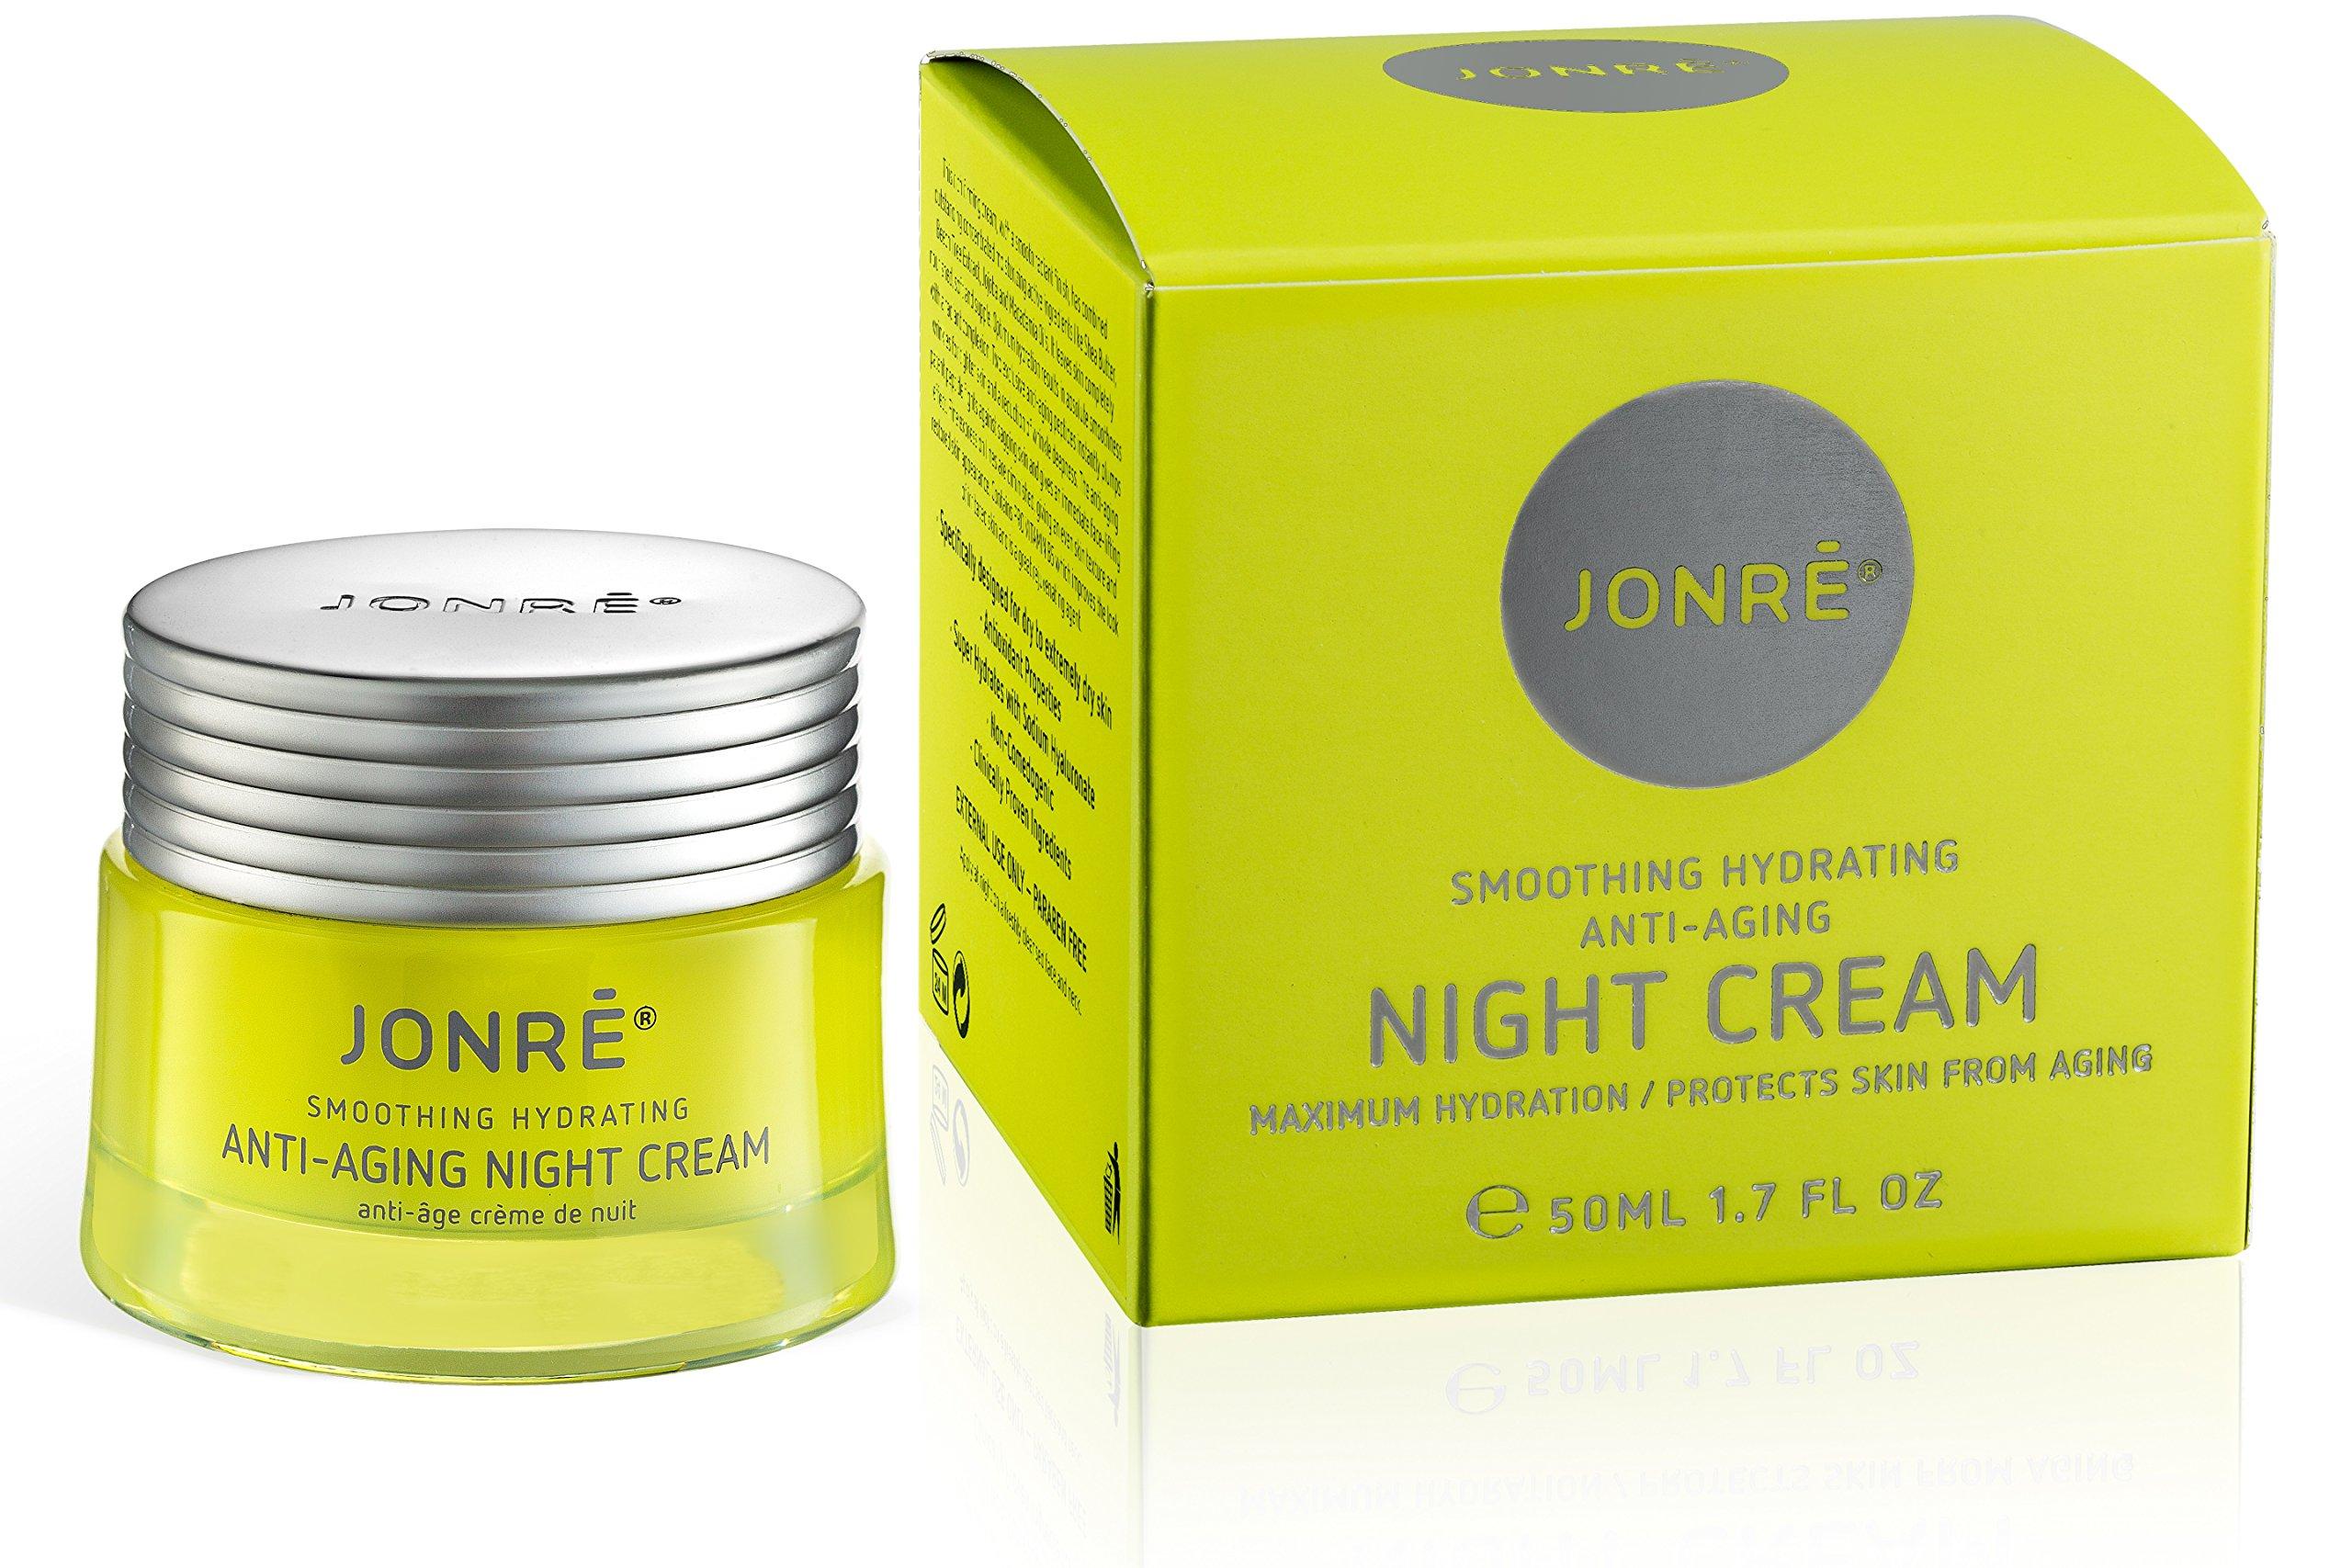 Amazon.com: Jonre ANTI AGING NIGHT CREAM, FACE MOISTURIZER, FREE YOUR DRY  ROUGH CREASED SKIN 1.7oz: Beauty